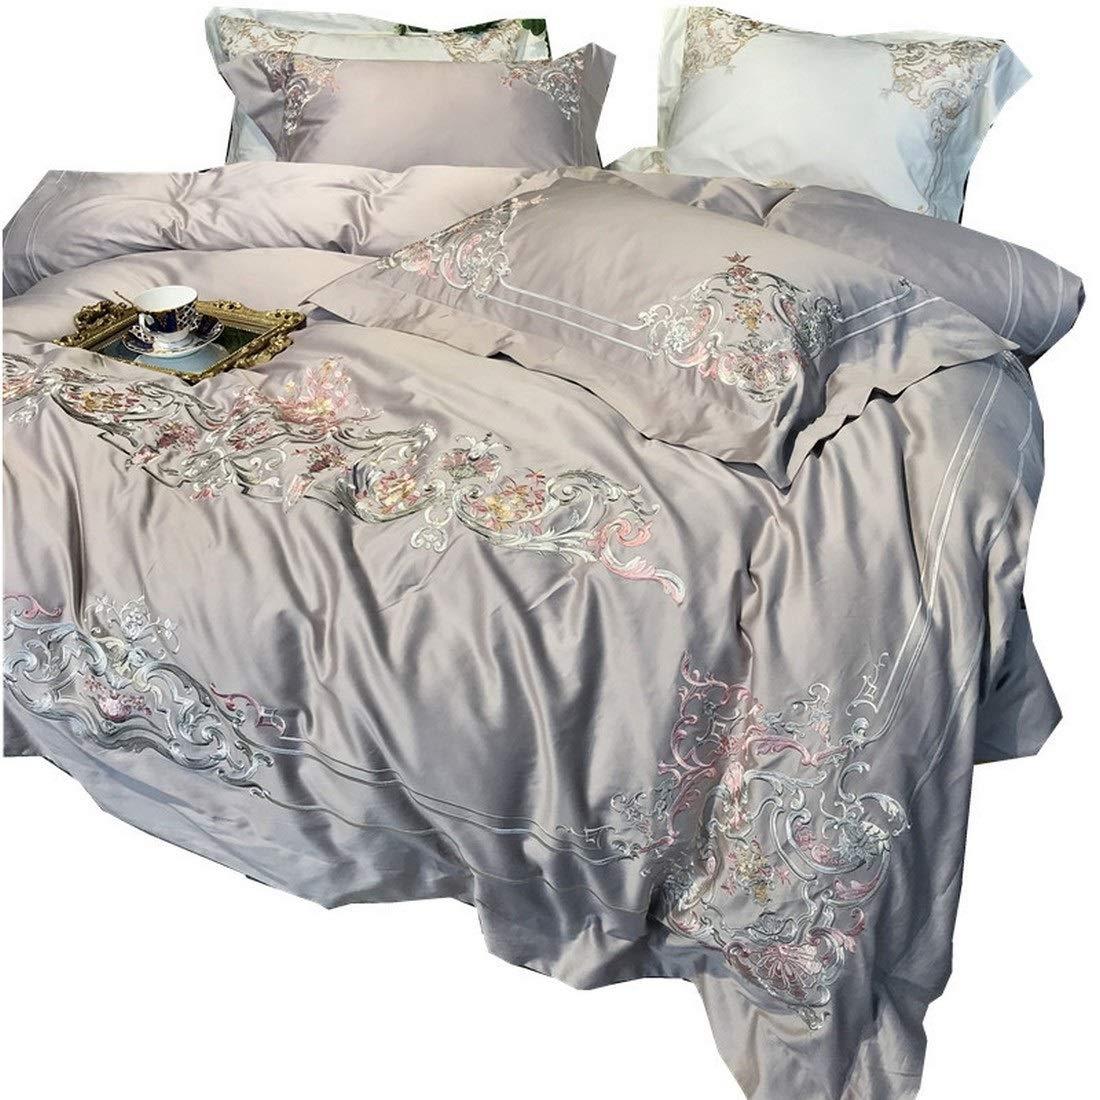 Kainuoo シンプルでタバコグレーの刺繍ロングベルベットコットンピュアコットン寝具セット4枚 (Size : QUEEN) B07NMT71V6  Queen